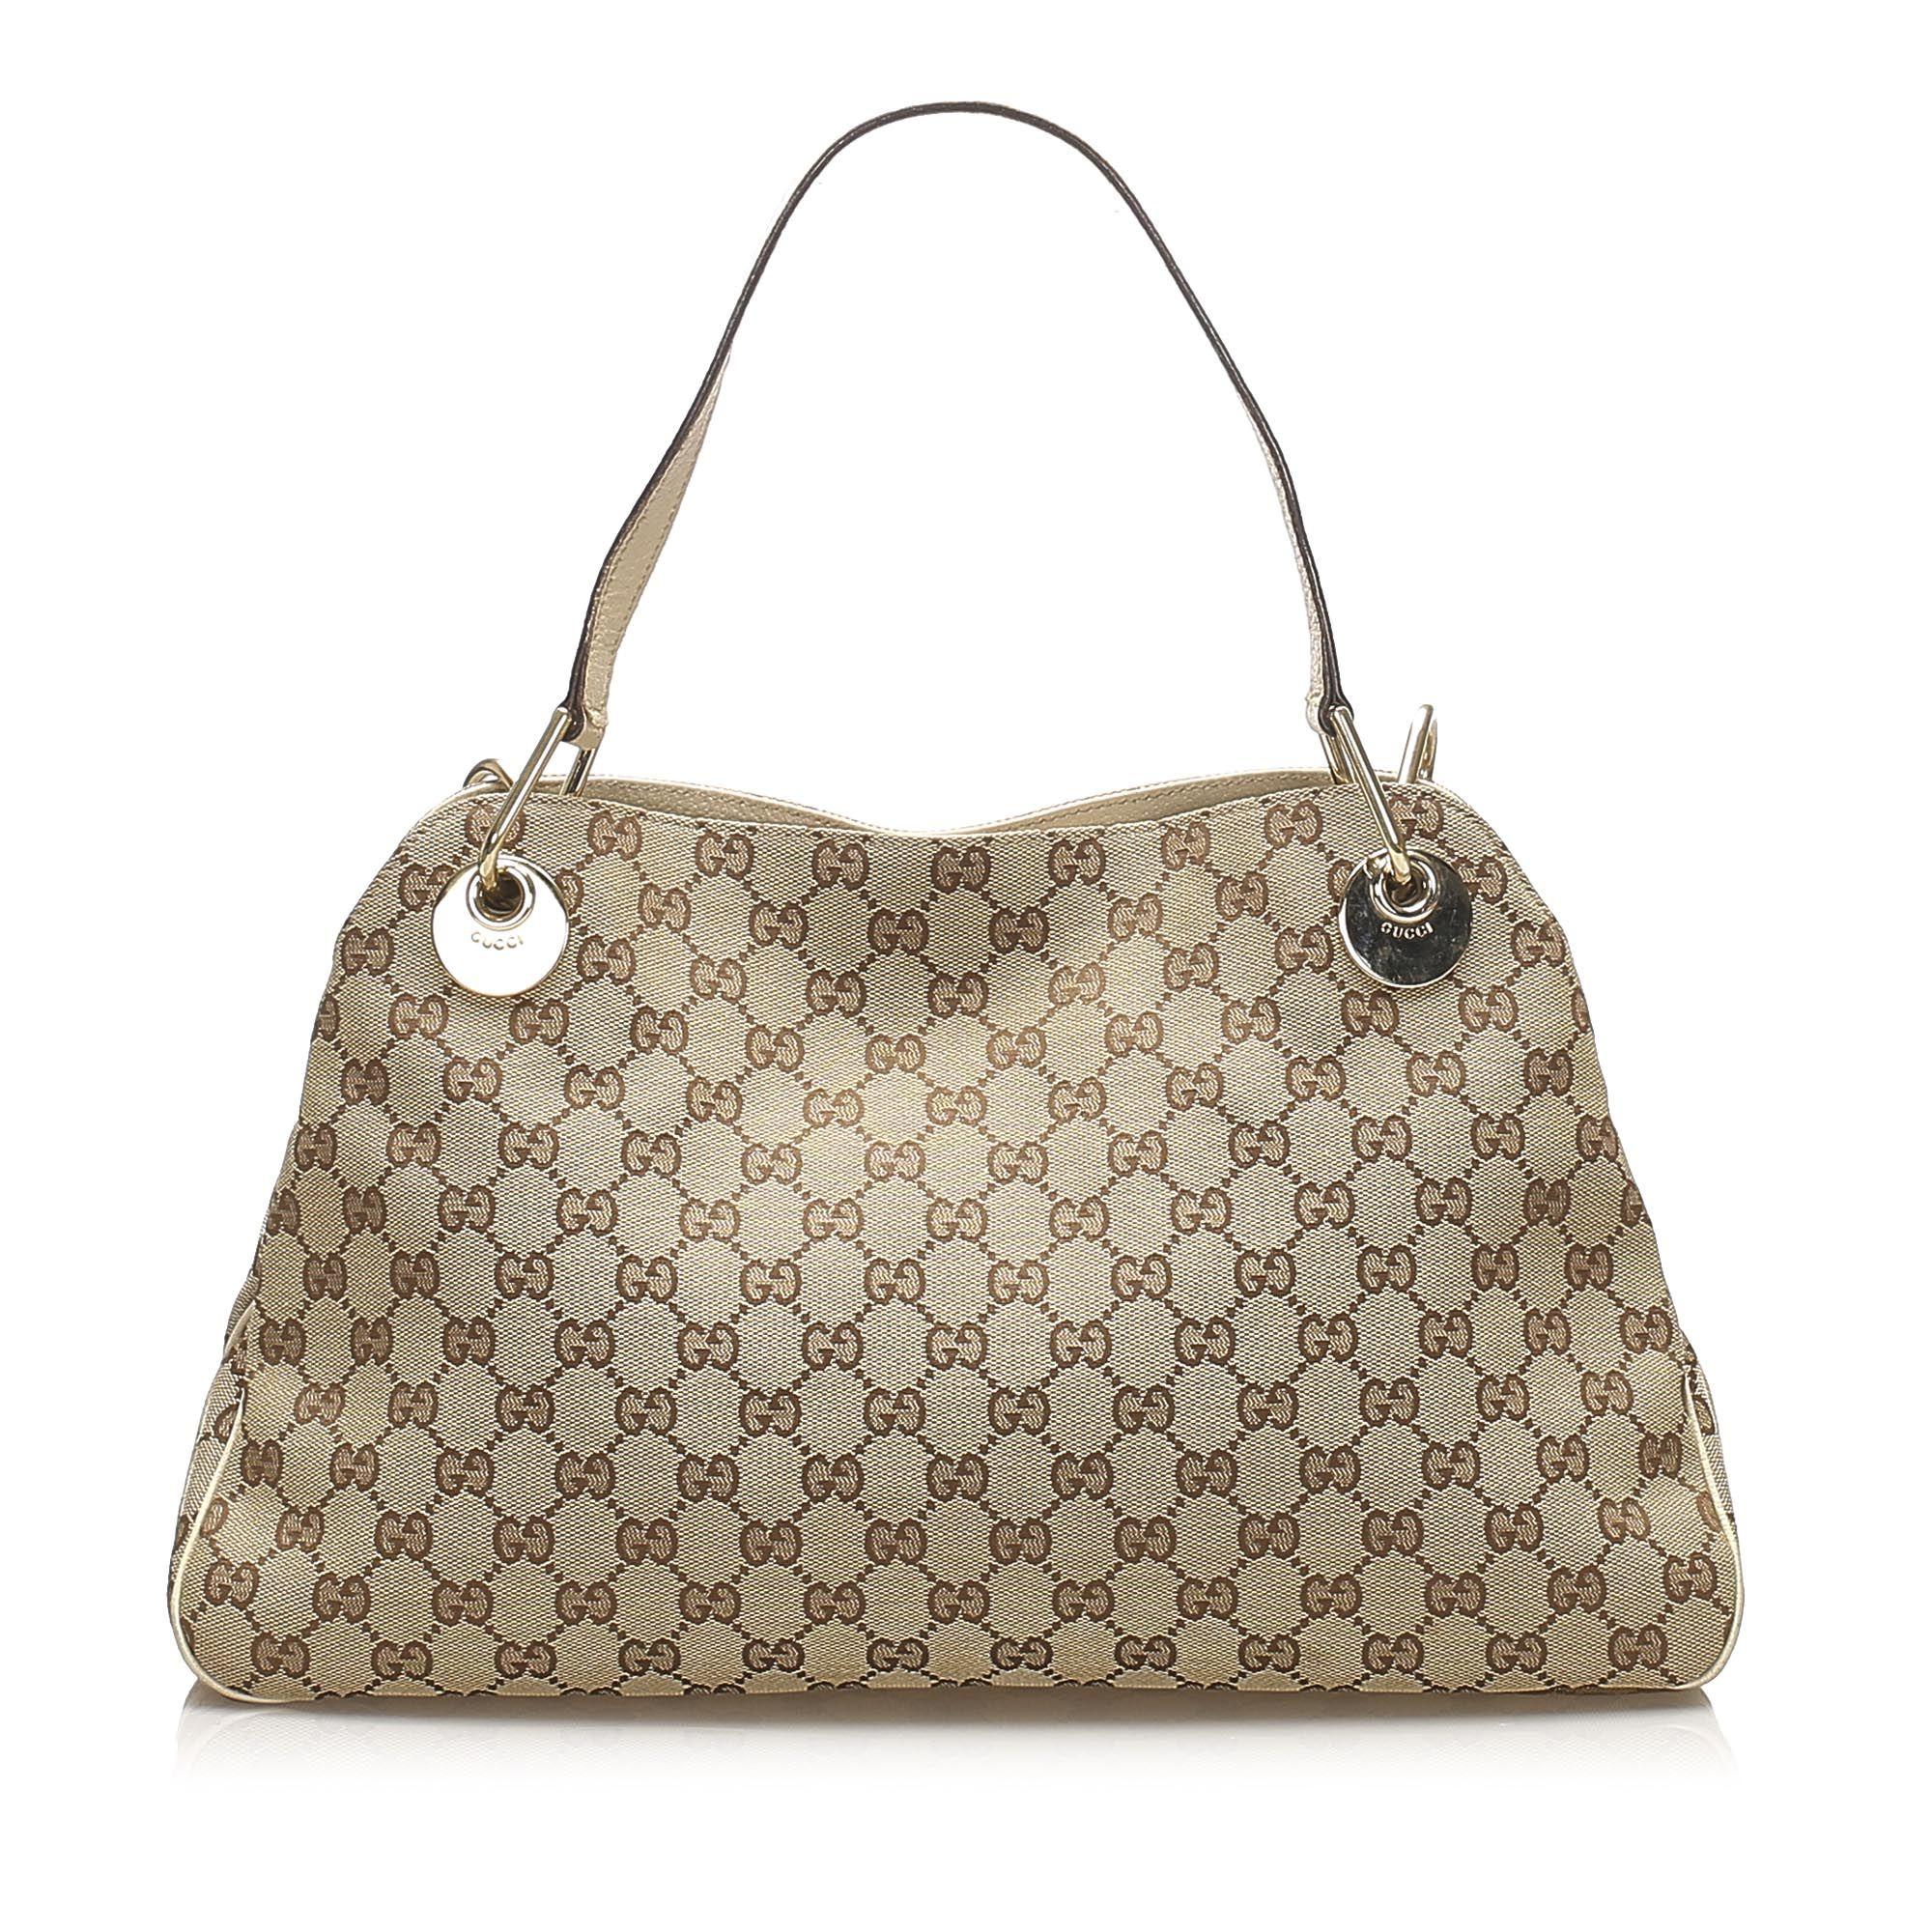 Vintage Gucci GG Canvas Eclipse Shoulder Bag Brown